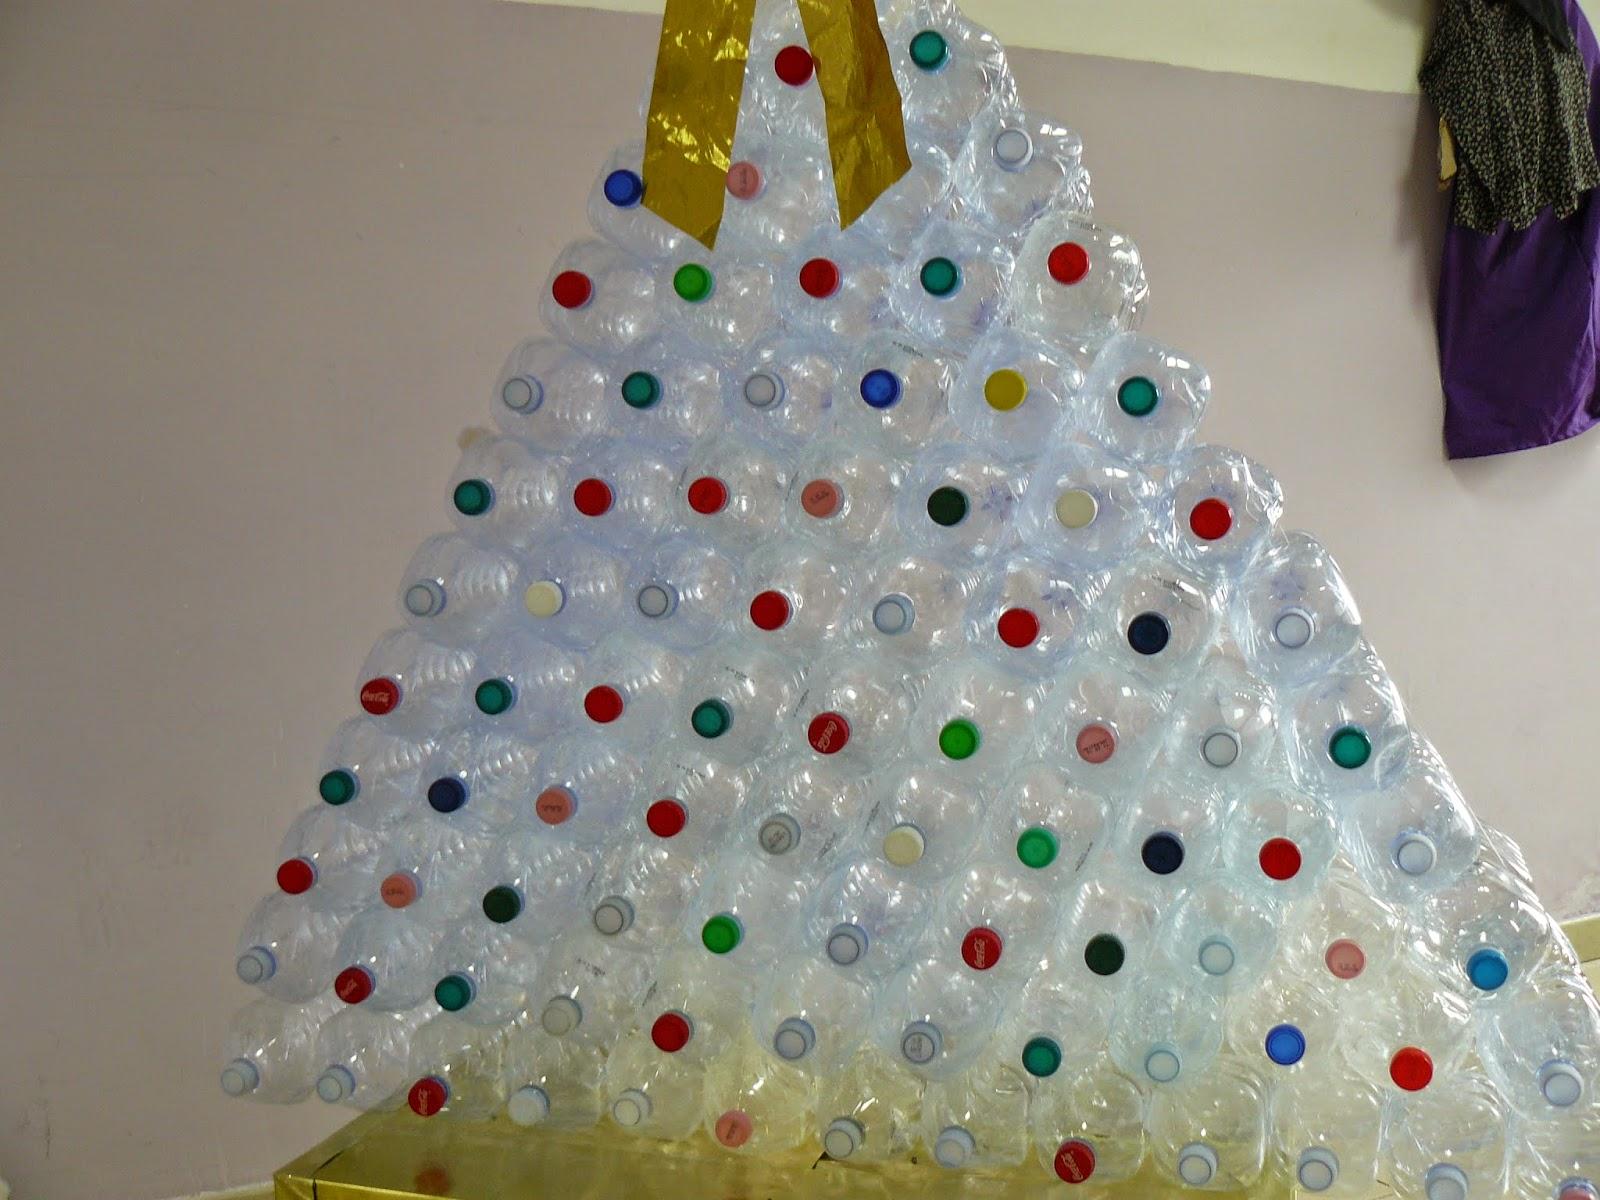 Laboratorio emozioni e creativit addobbi natalizi for Addobbi natalizi scuola primaria